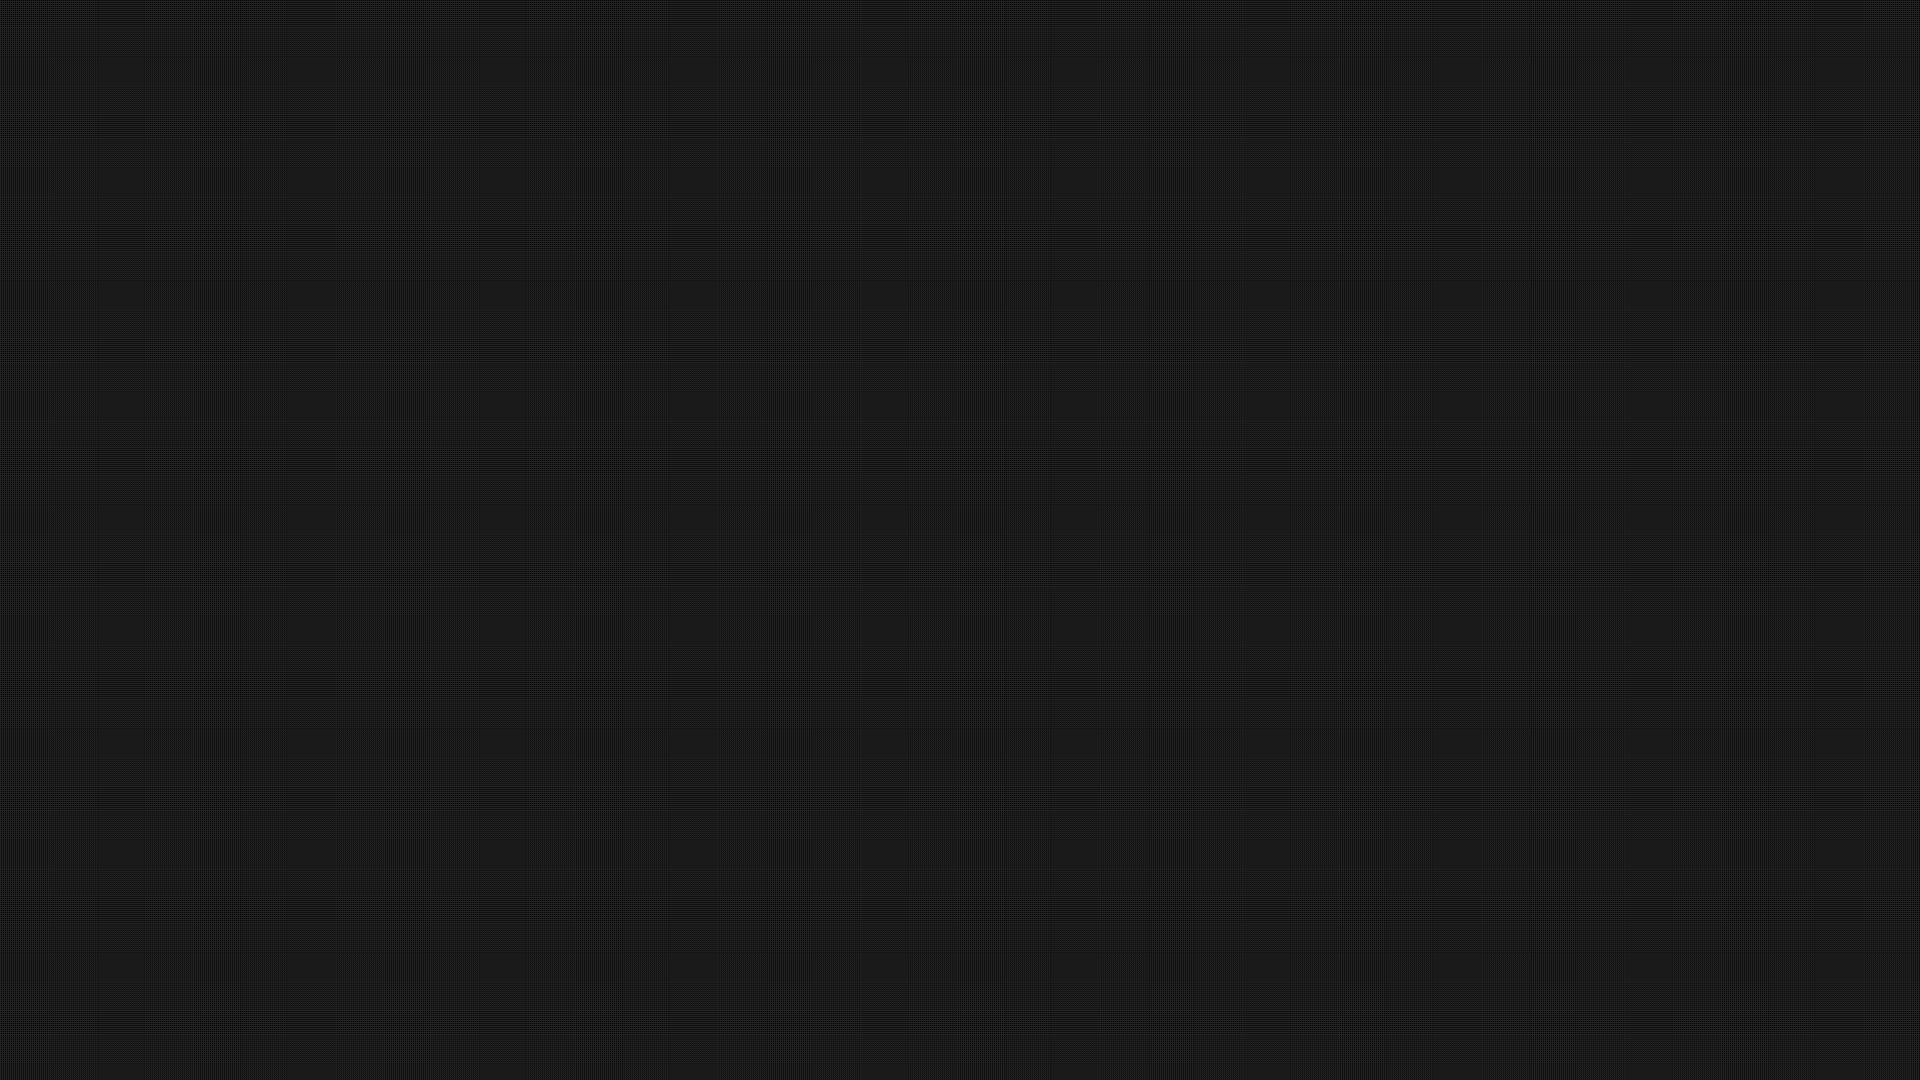 black texture wallpaper 1920x1080 - photo #41